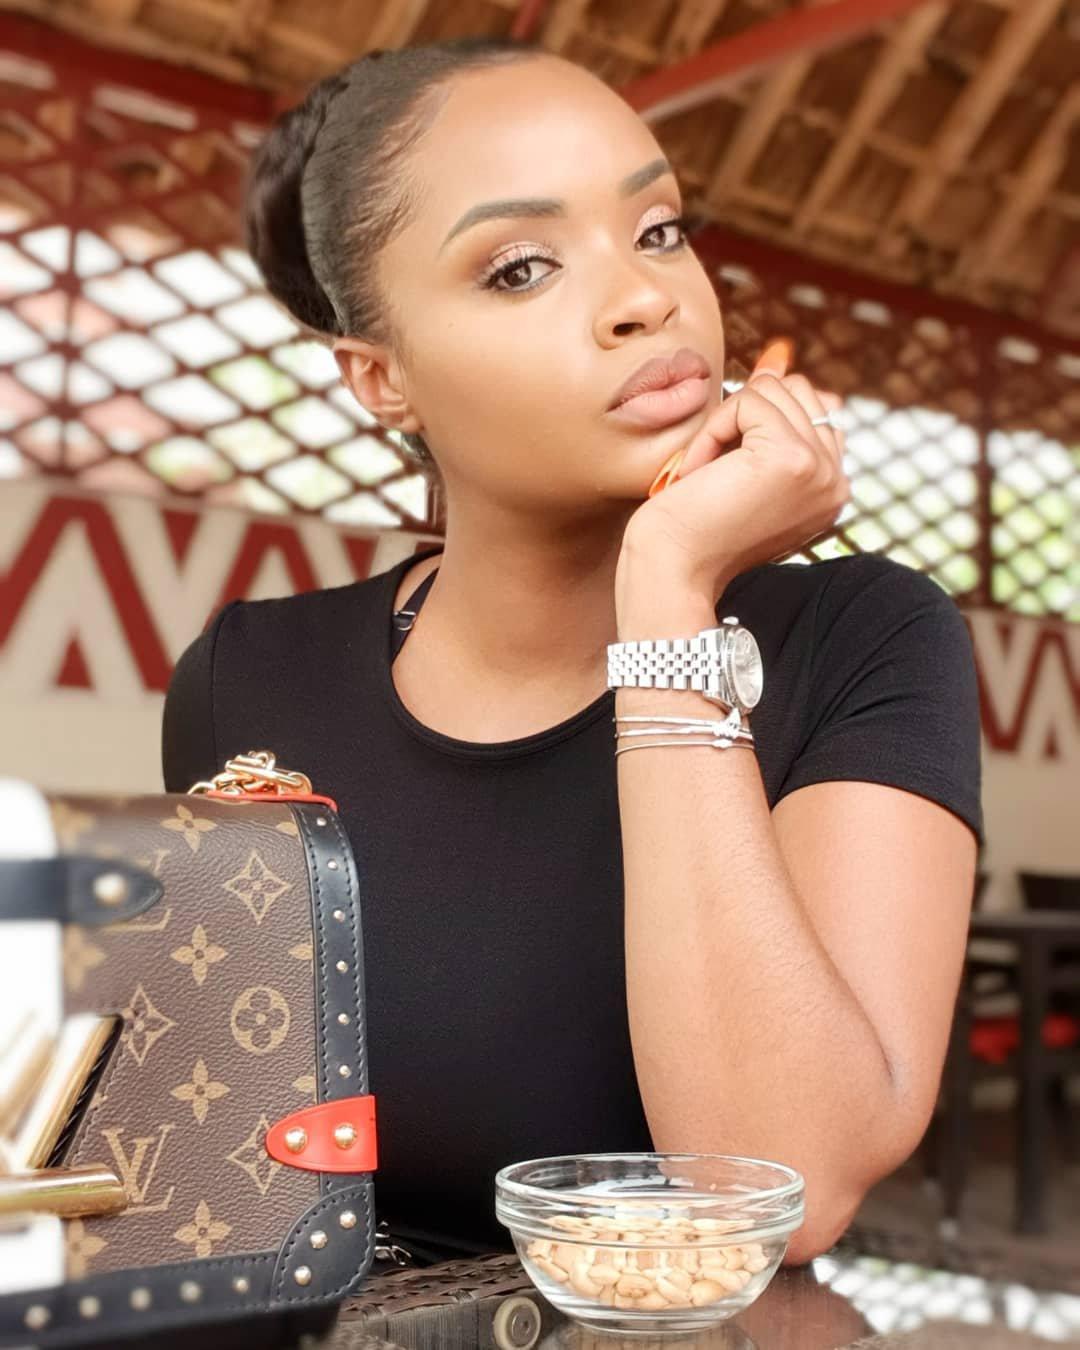 Dillish Matthews Shares Cute Videos with Beau Emmanuel Adebayor